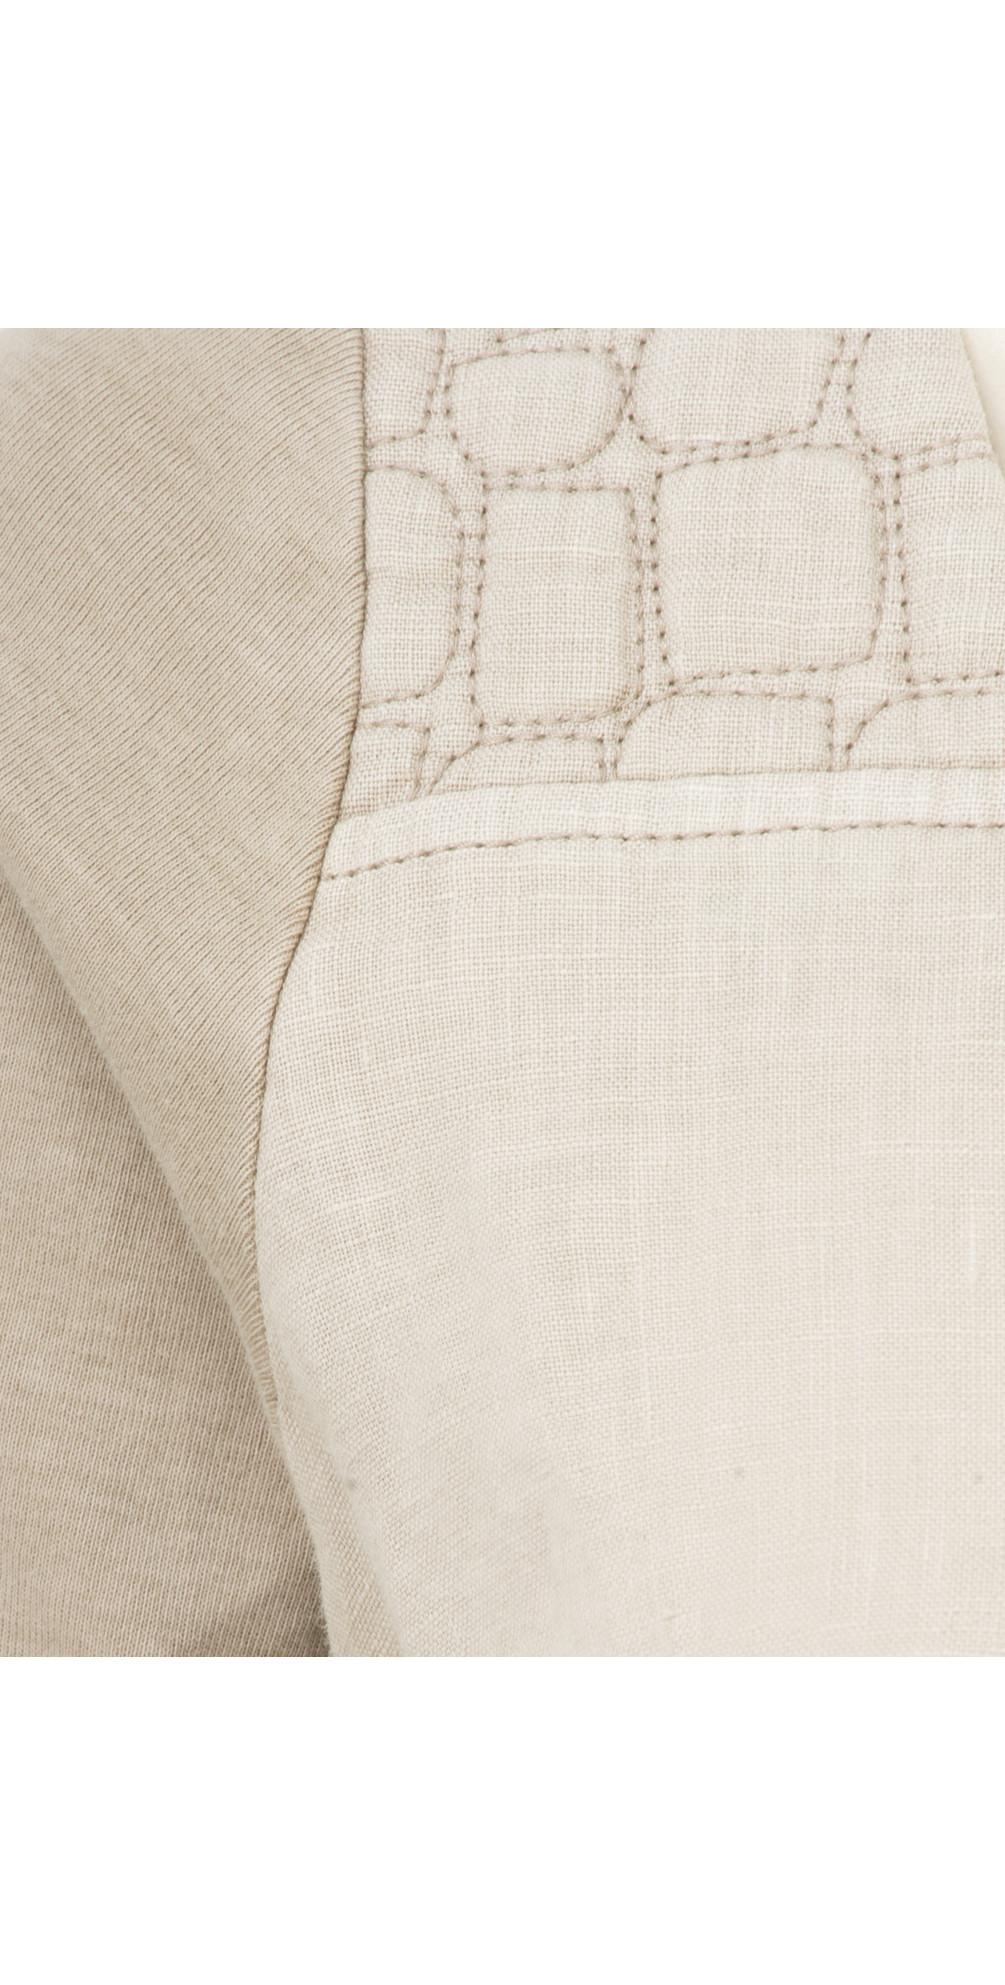 Woven Linen Dye Dress main image